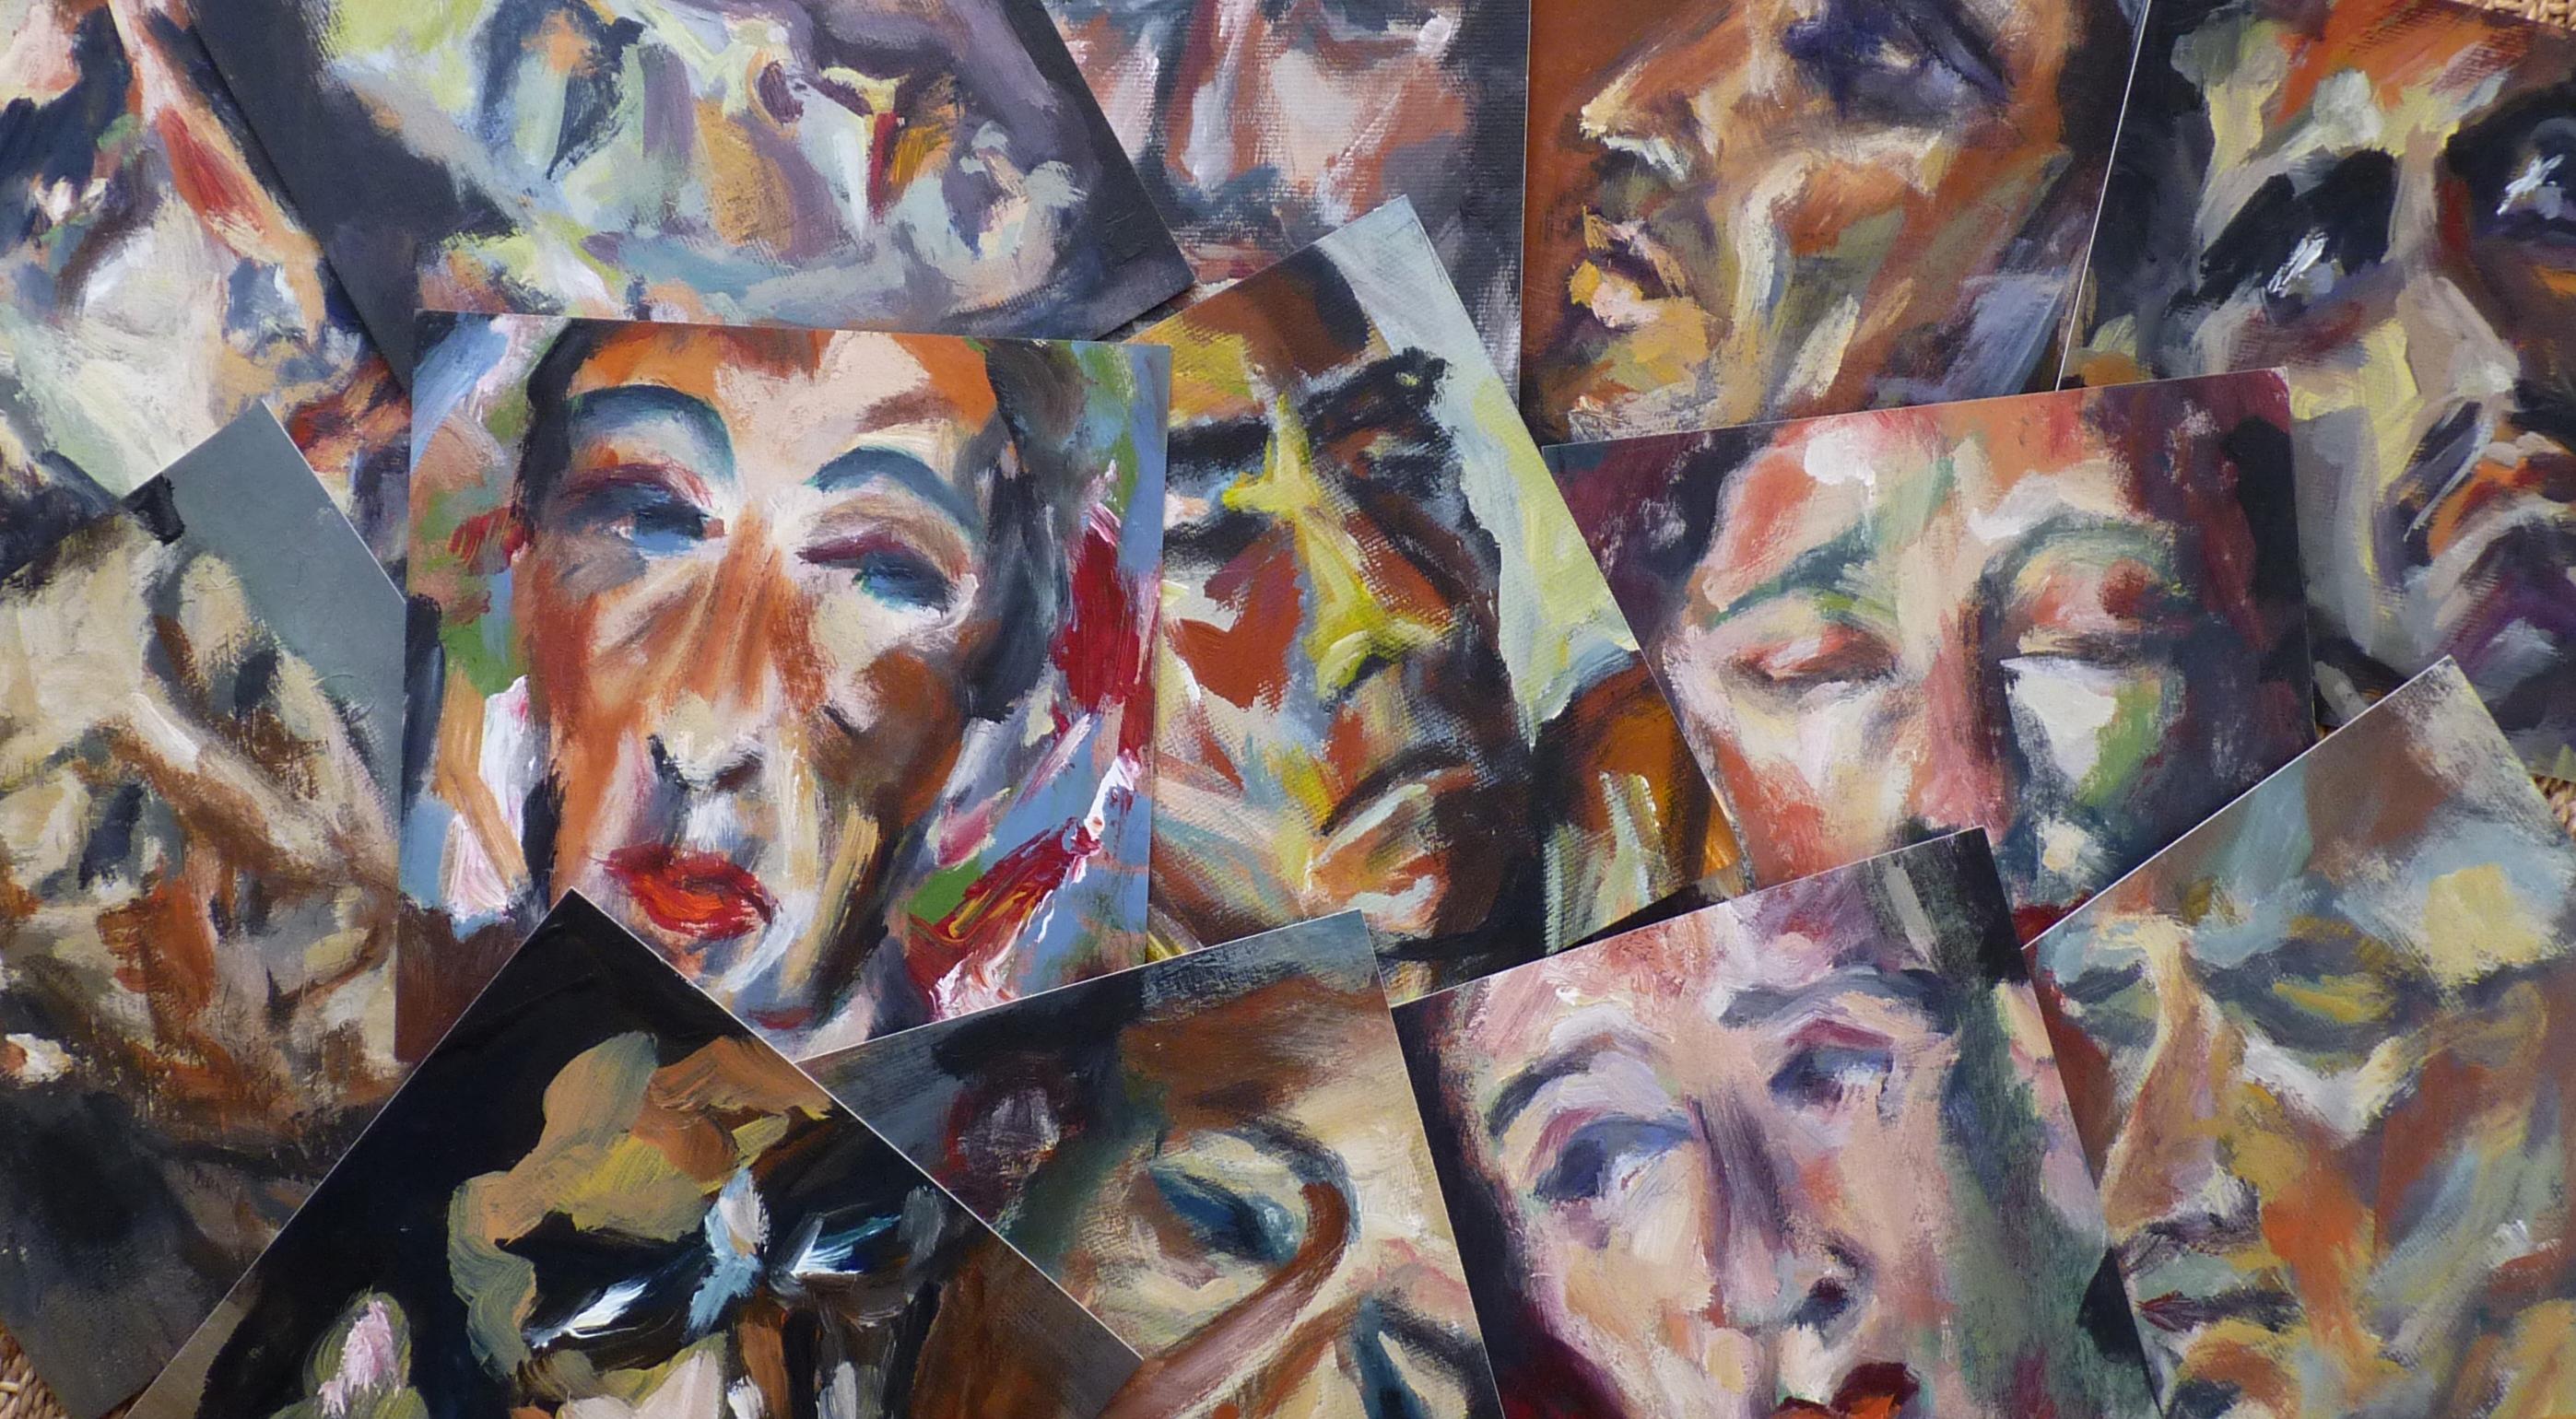 Les 111 des Arts de Paris 2013